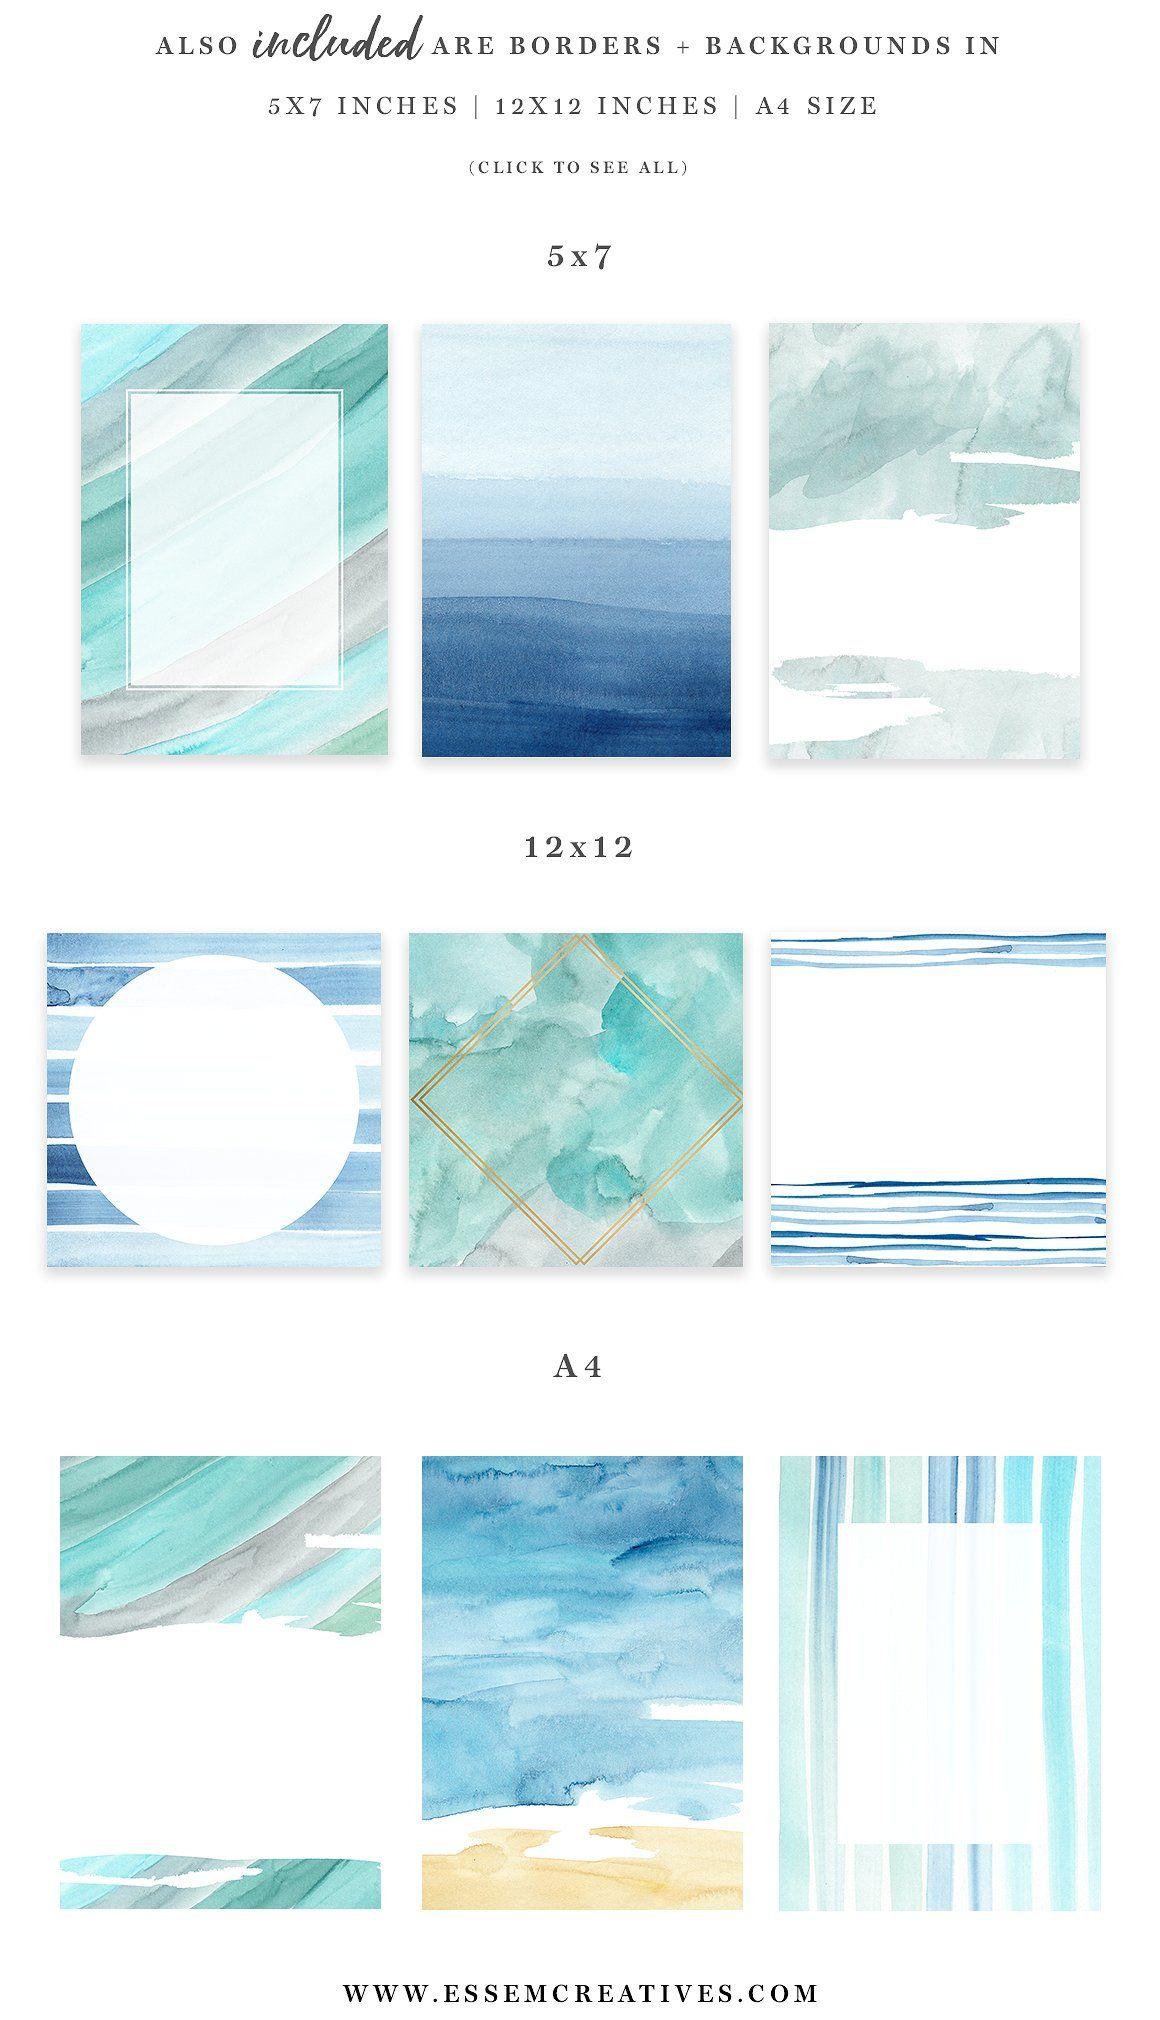 Ocean Beach Watercolor Backgrounds Vizualnyj Obraz Dizajn